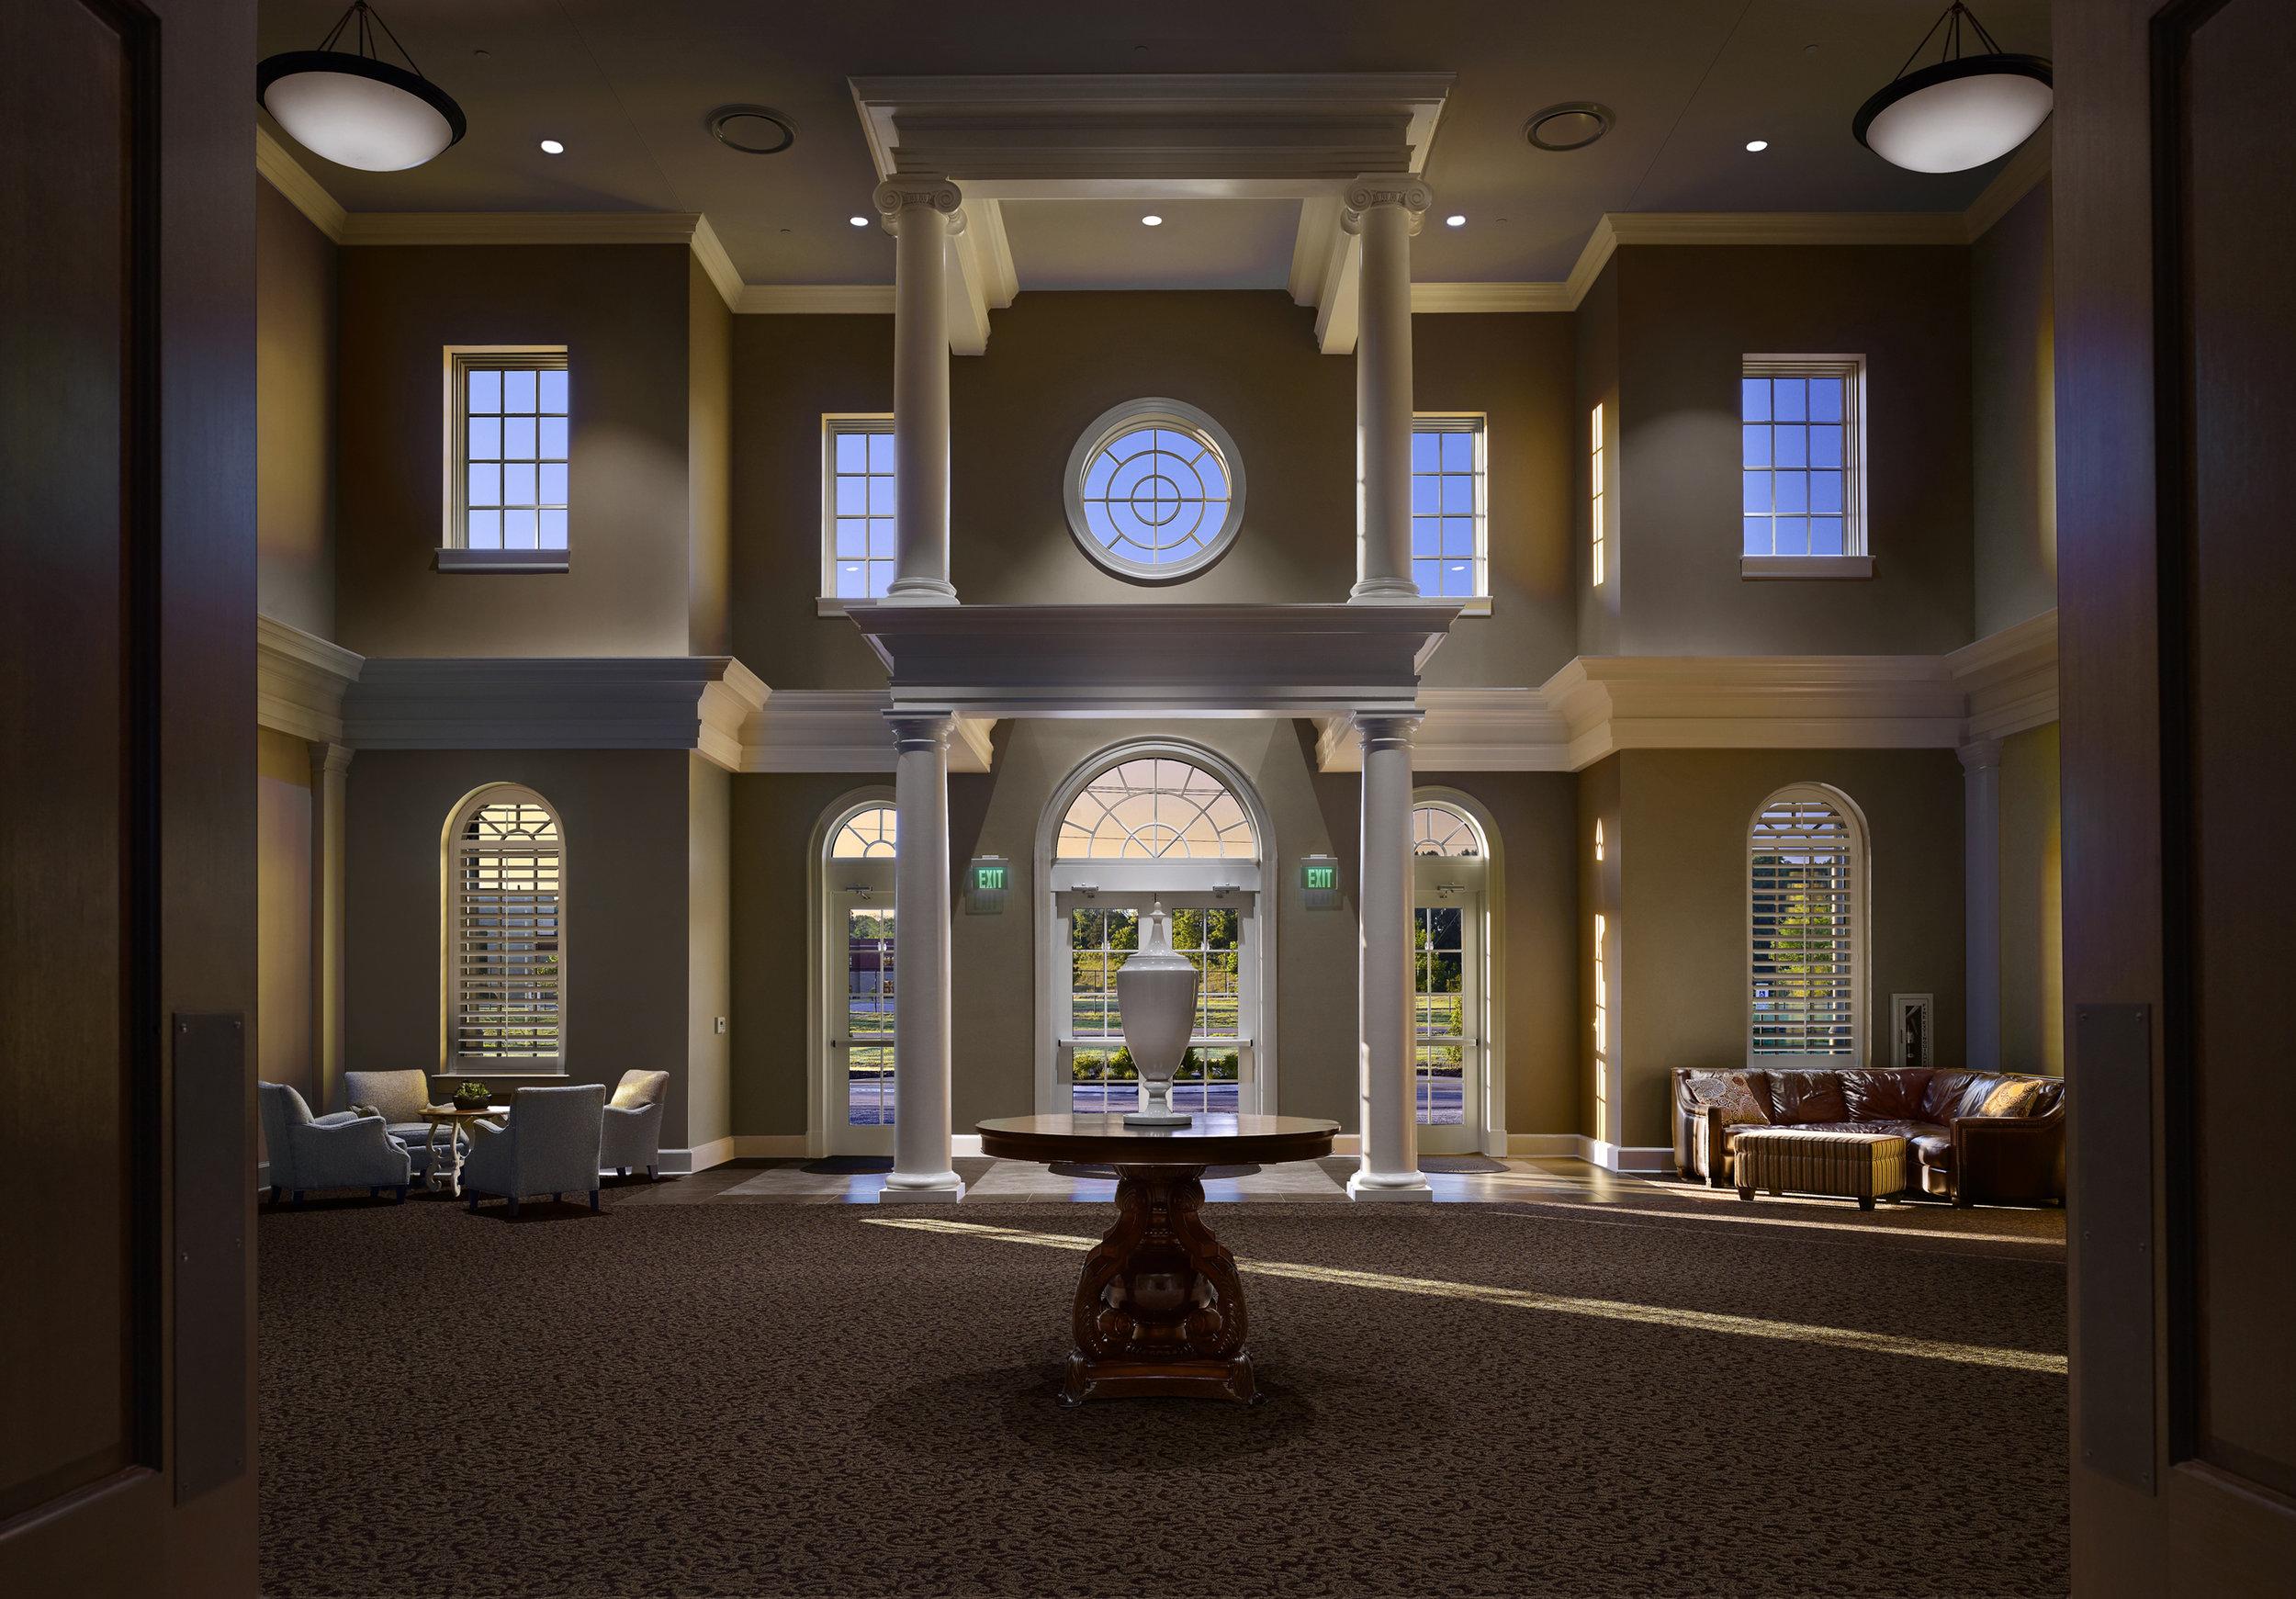 02_Hord Architects_Crossroads Baptist_Interior - 9 in wide, 300 dpi.jpg